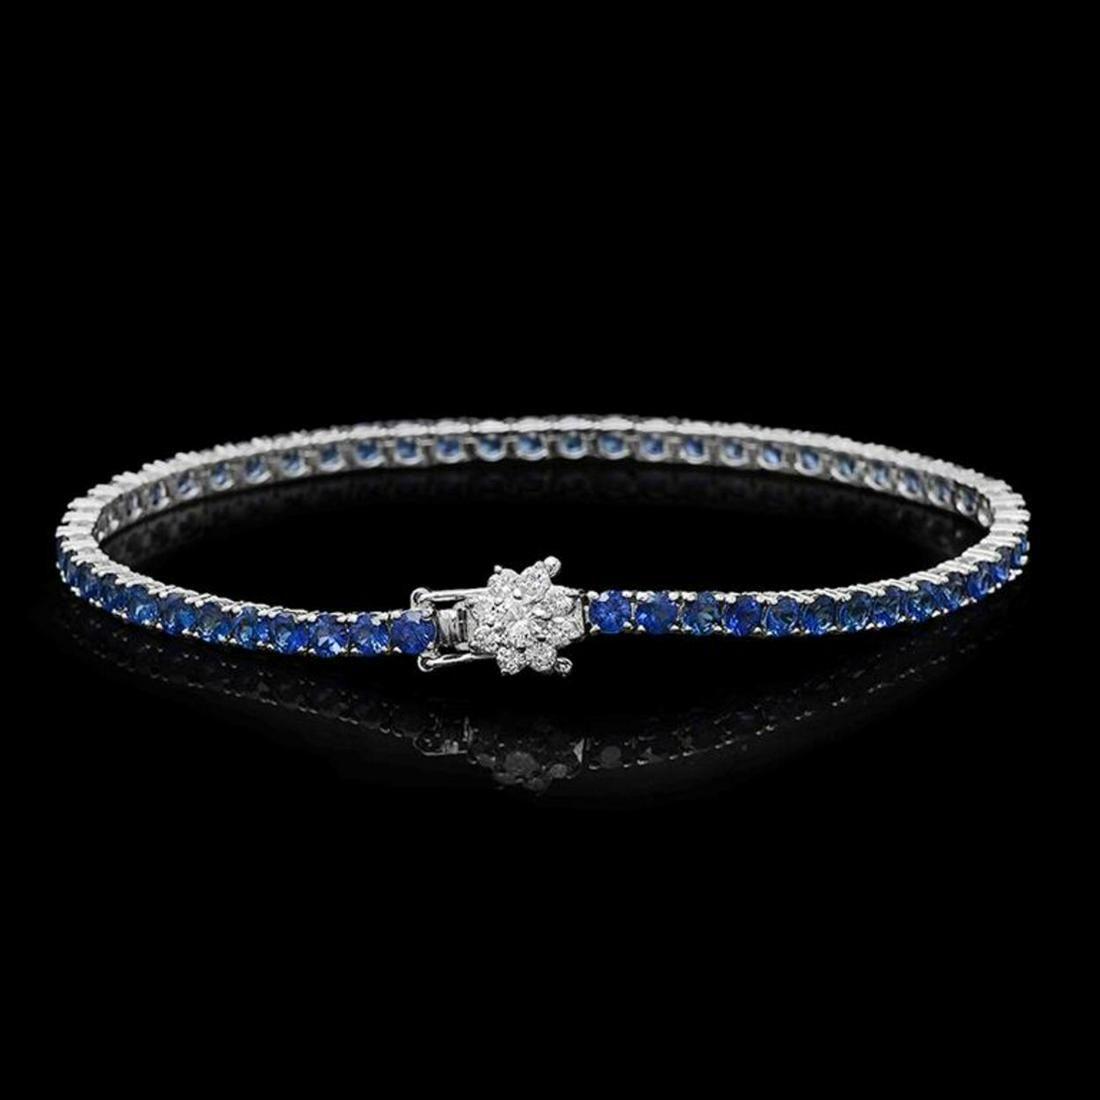 14K Gold 7.16ct Sapphire 0.52ct Diamond Bracelet